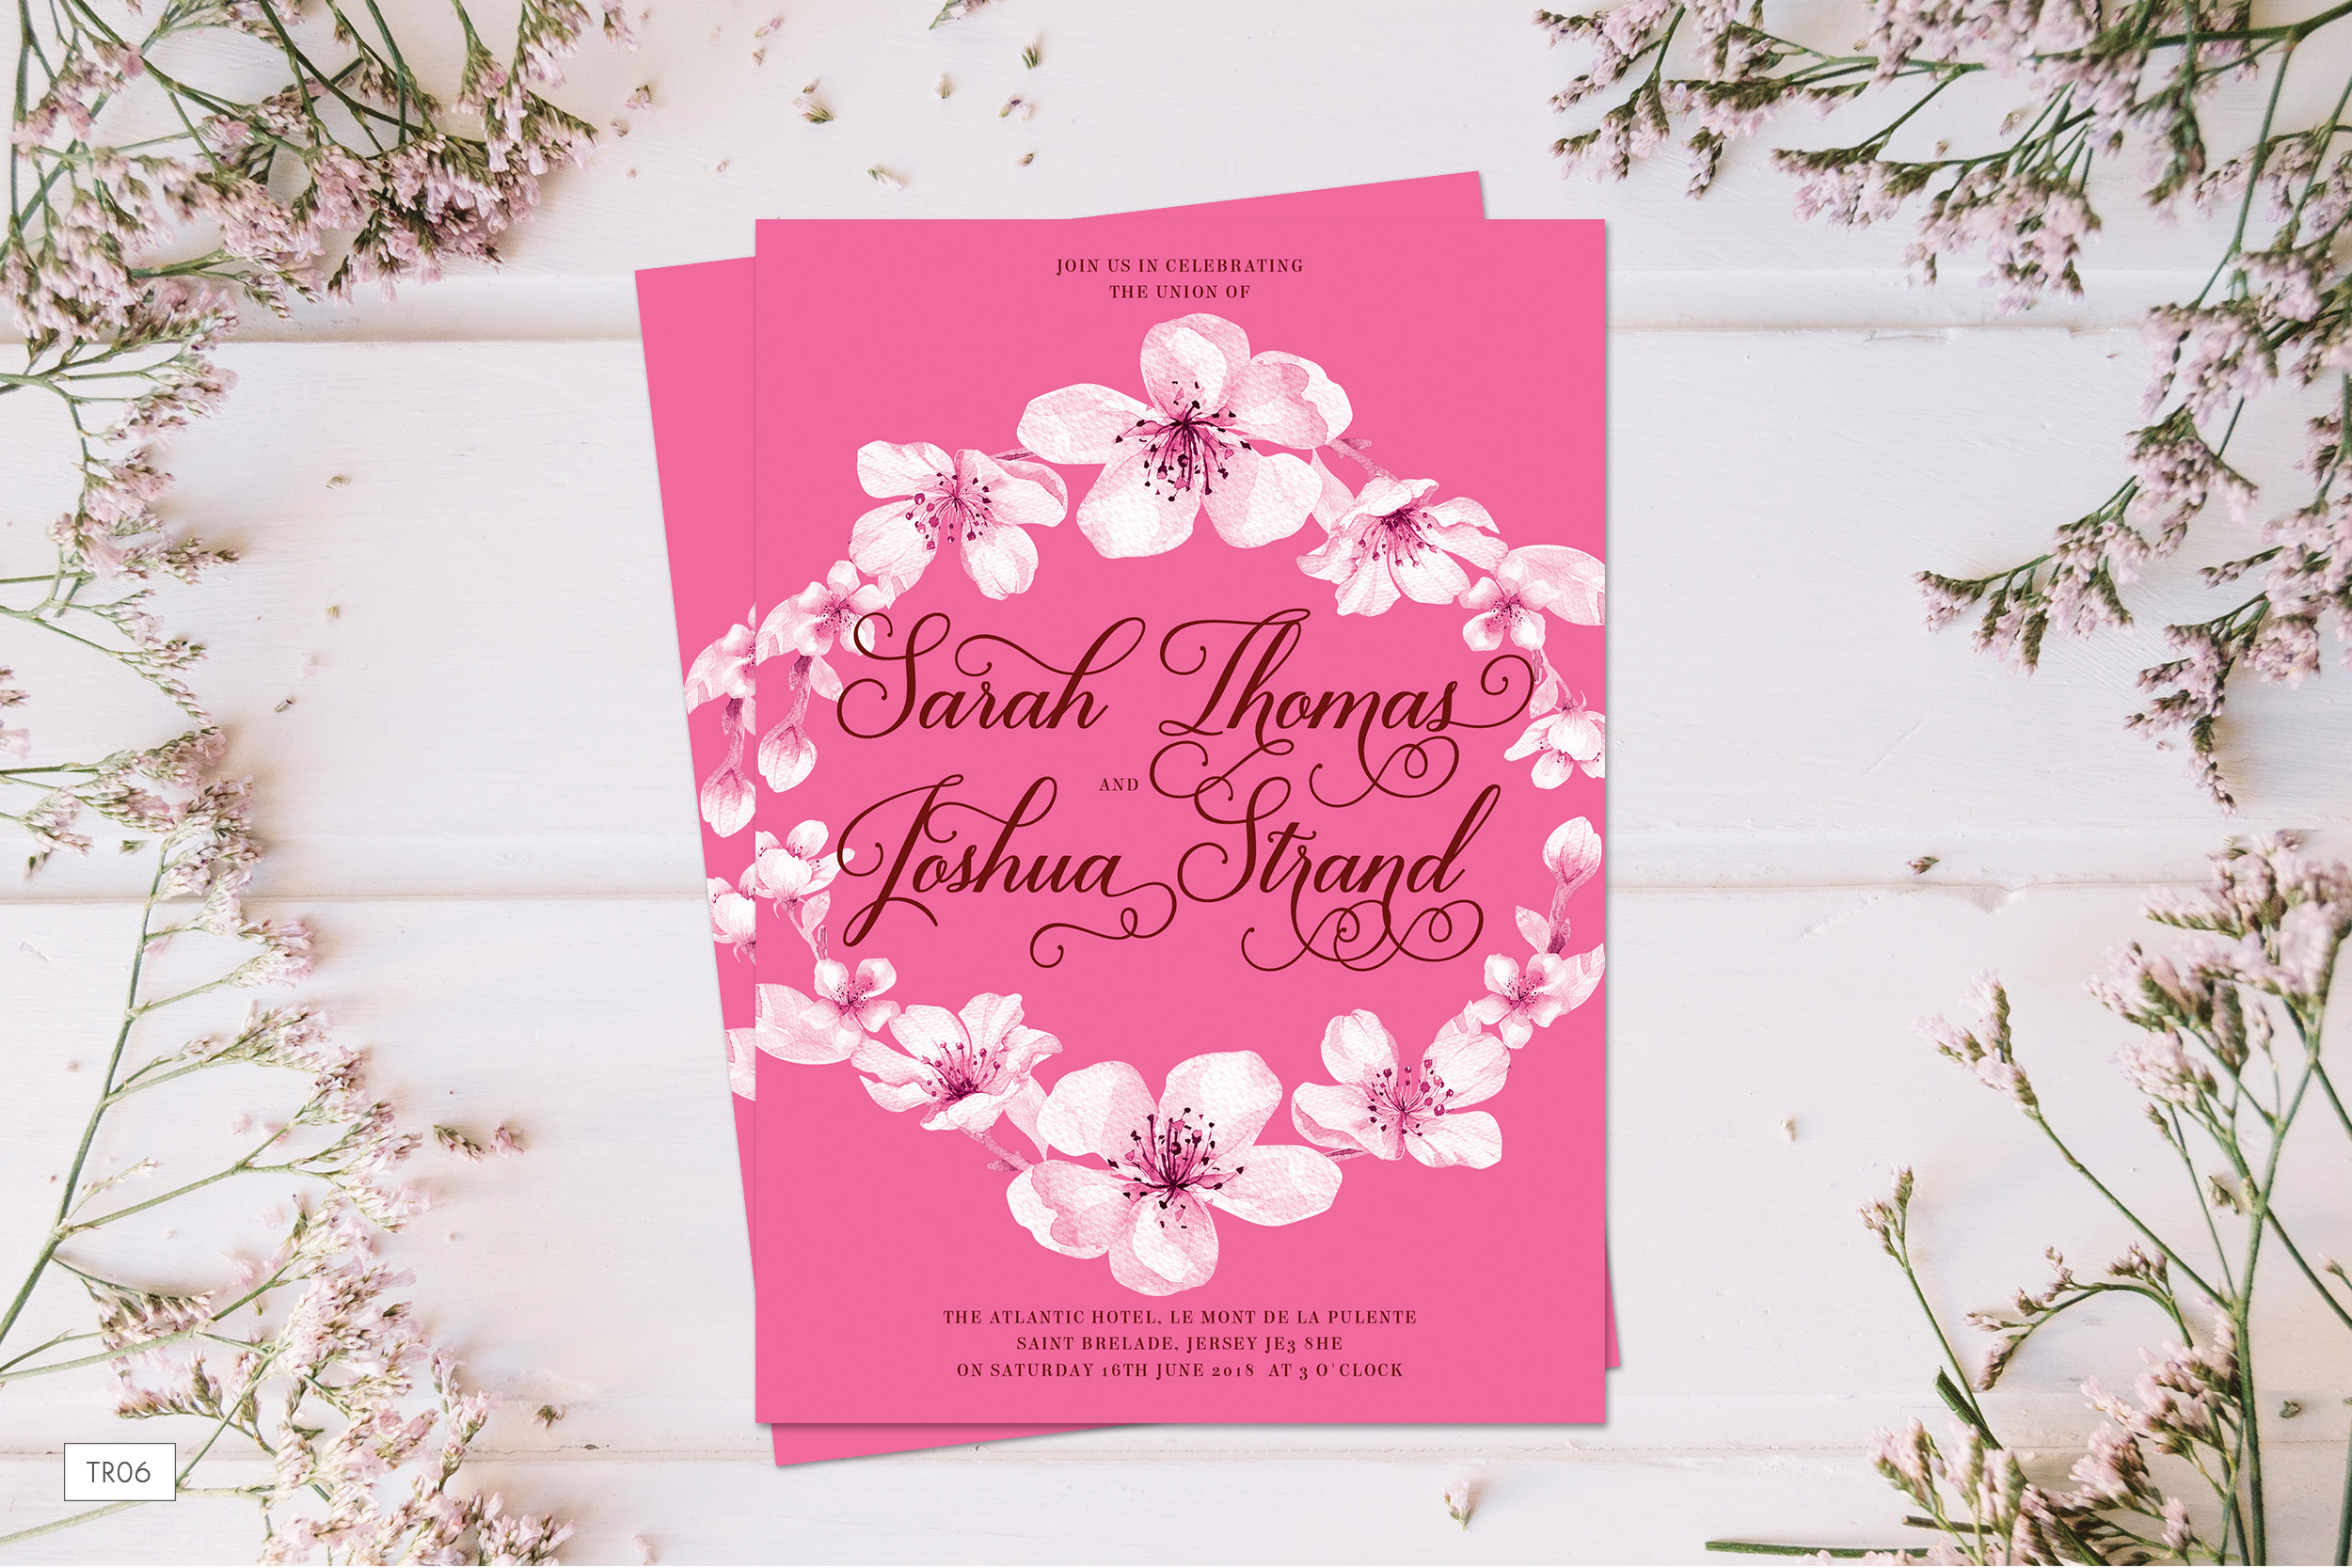 tr05-tropical-orchids-wedding-invitation-pink.jpg